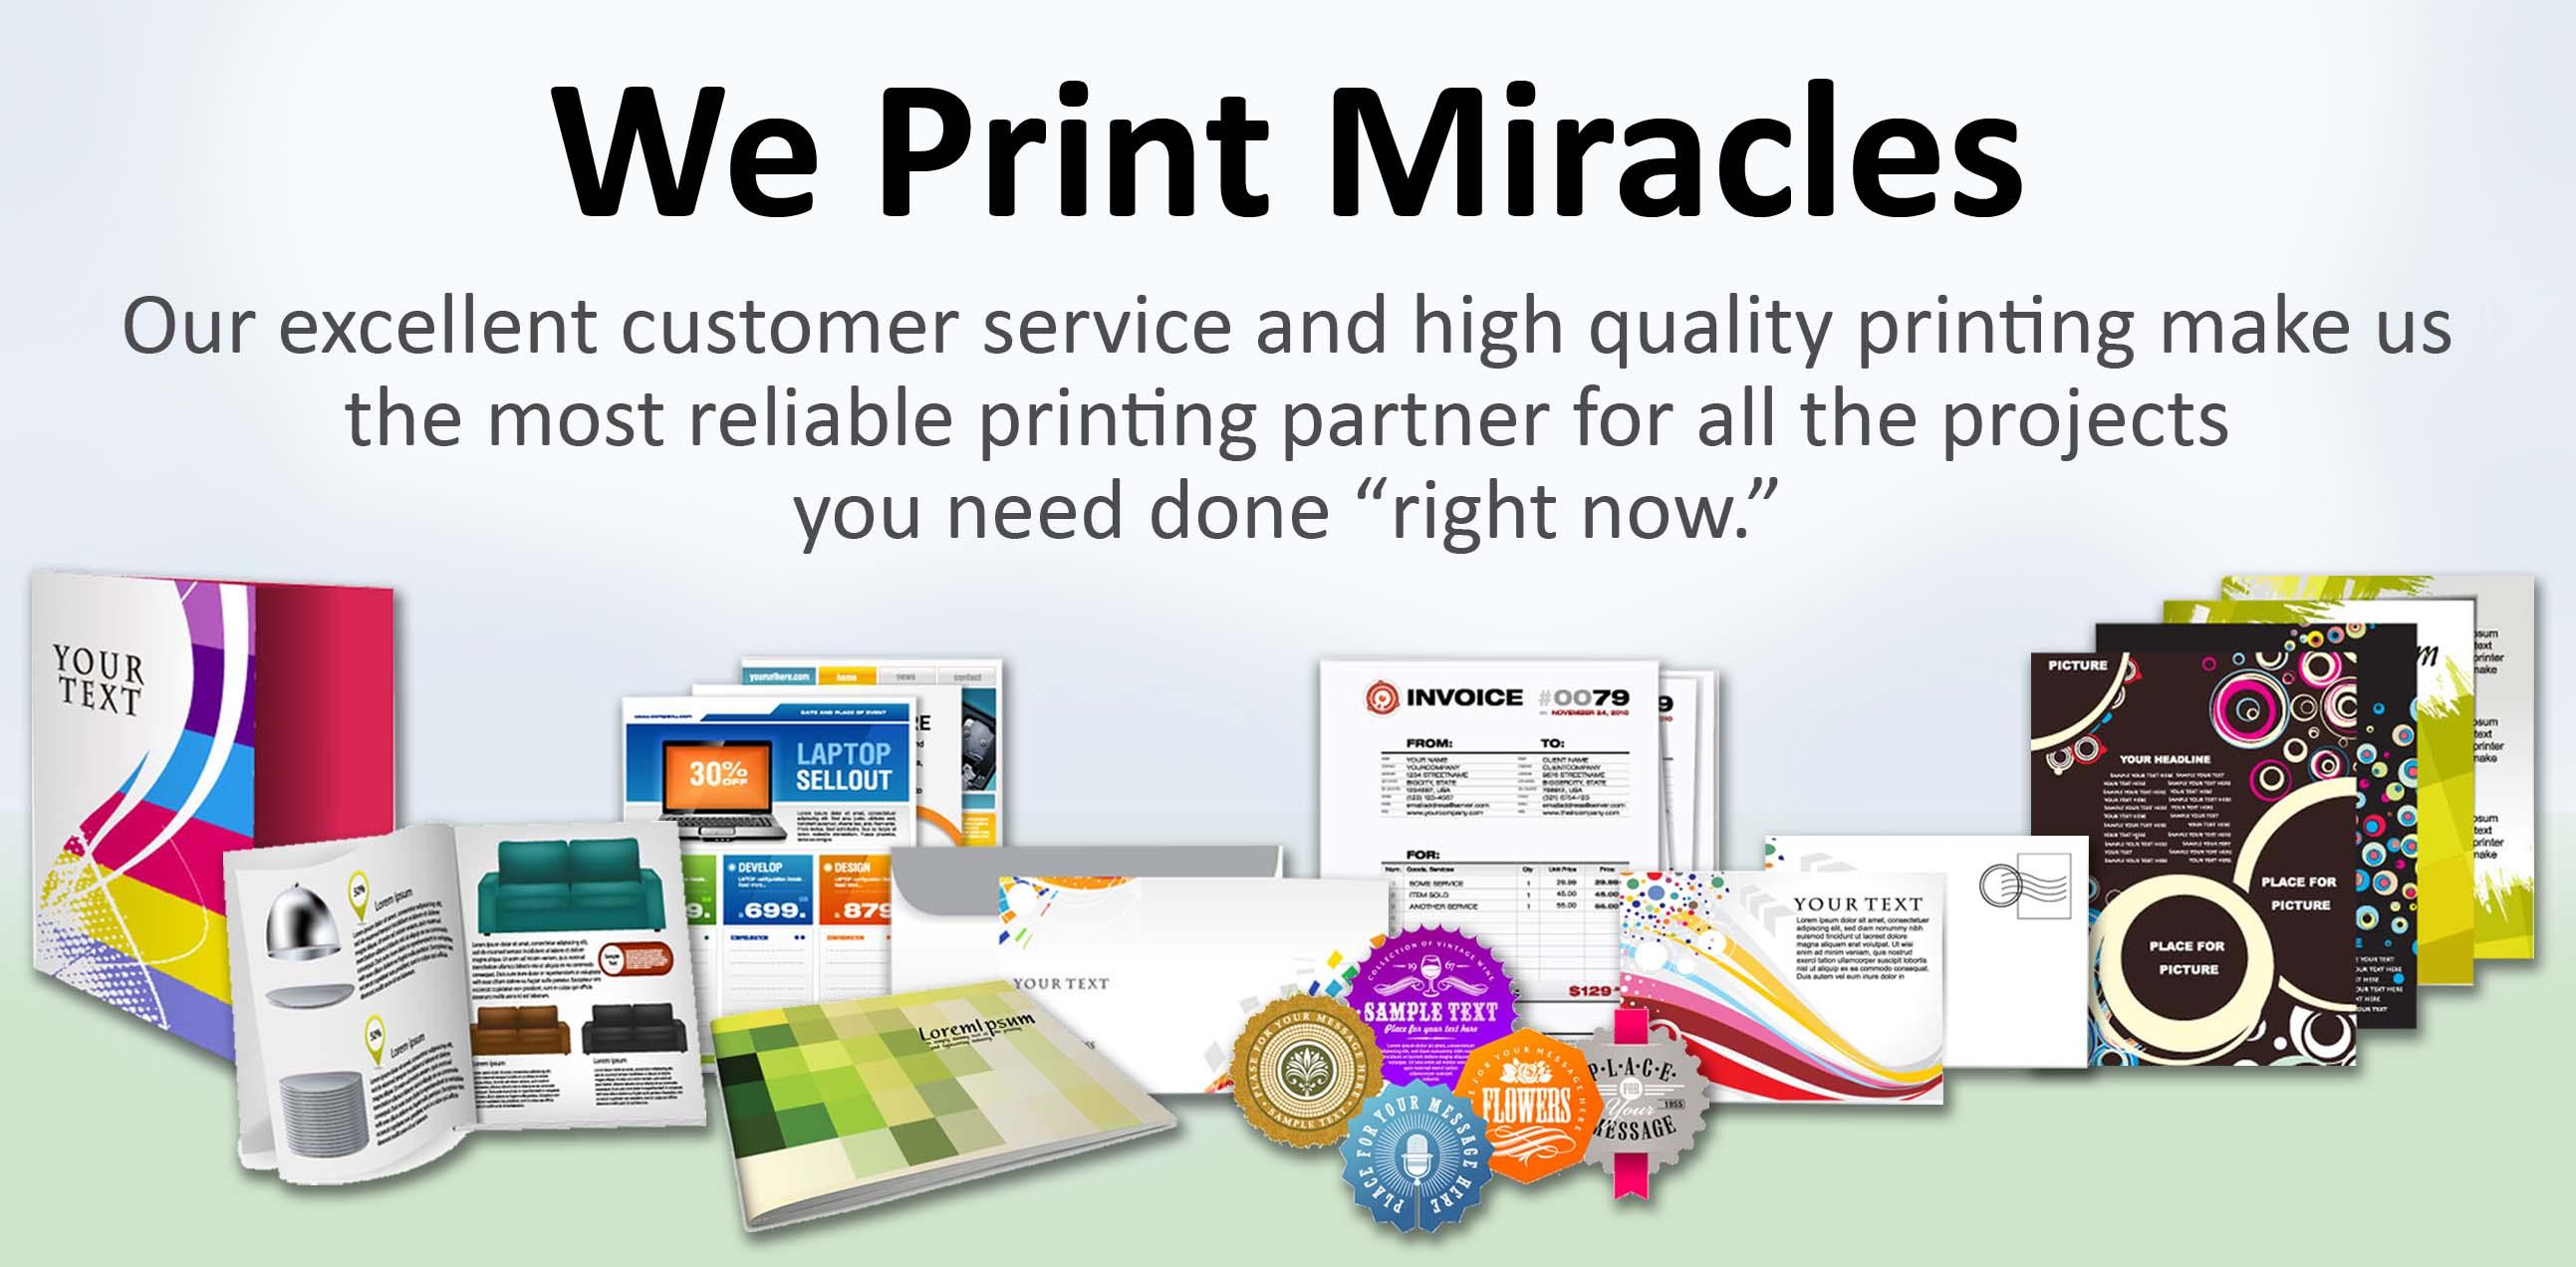 We Print Miracles